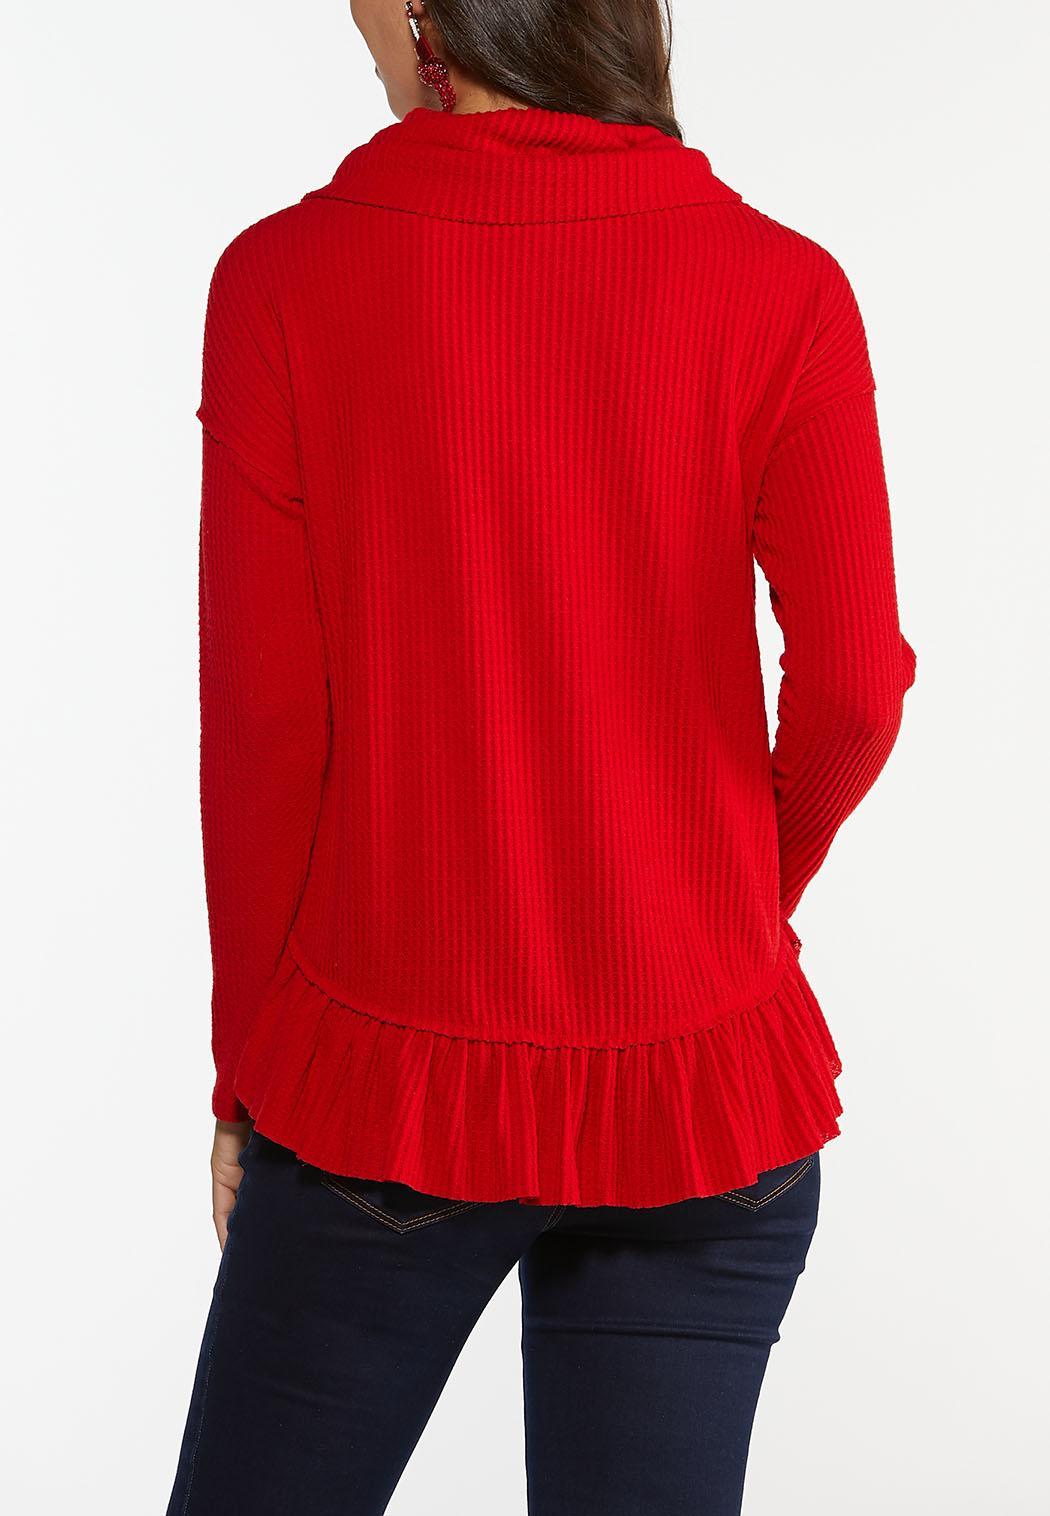 Cowl Neck Peplum Top (Item #44406005)